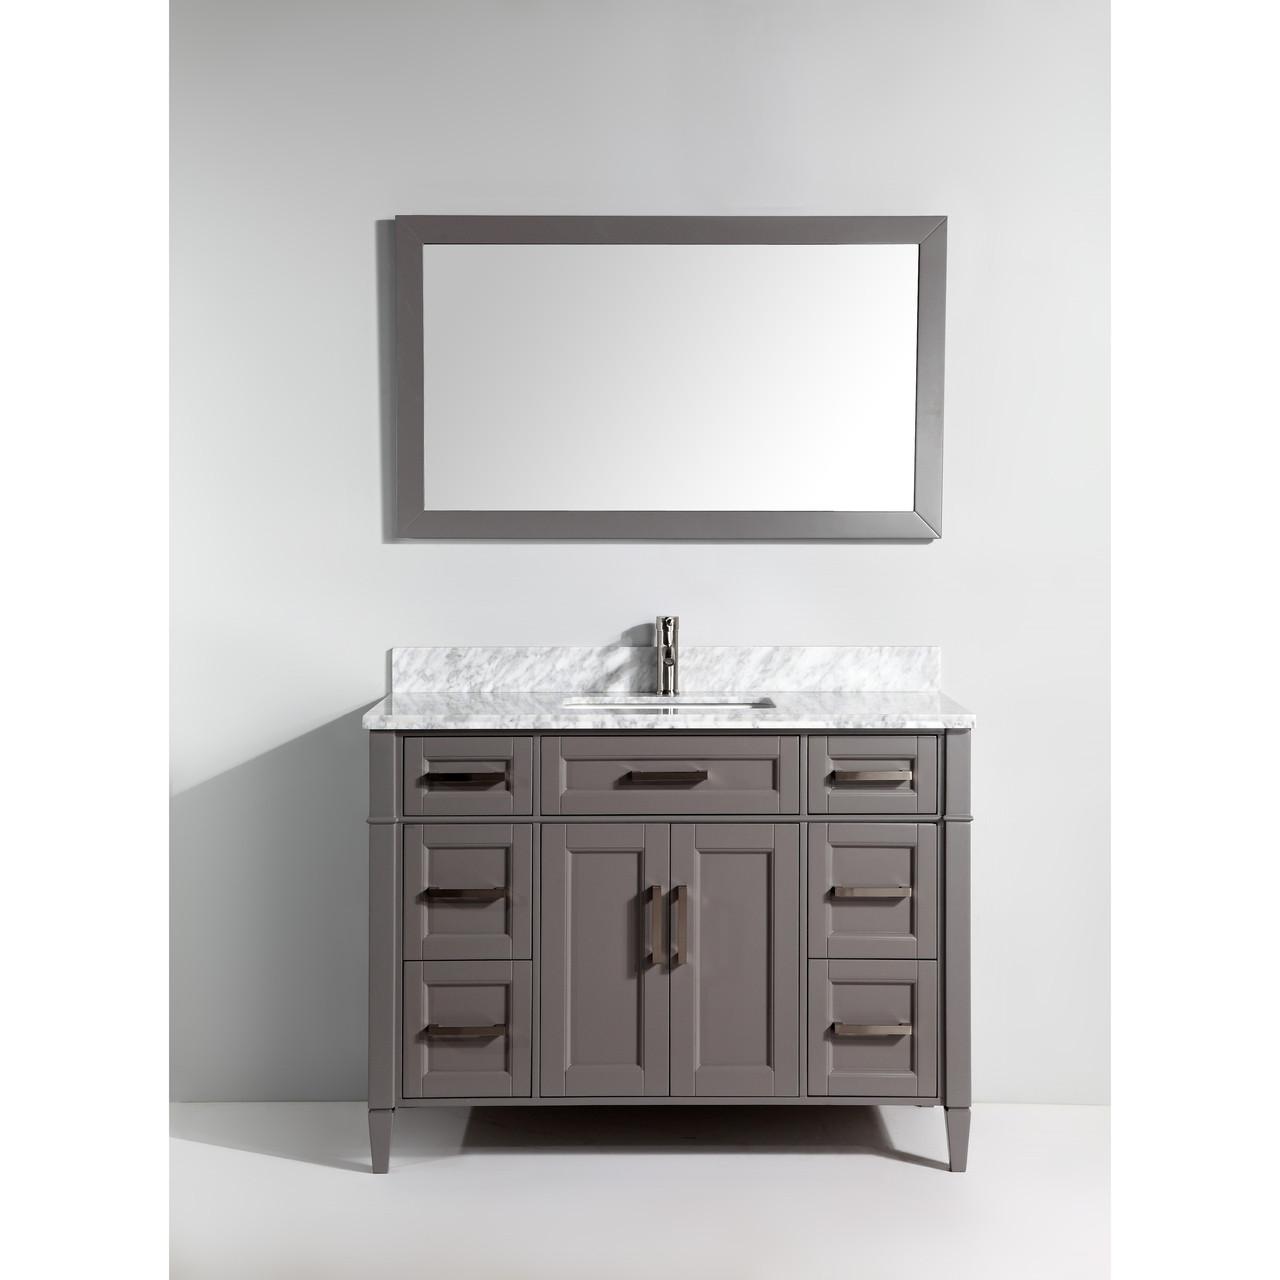 Vanity Art Va2060g 60 Inch Single Sink Vanity Cabinet With Carrara